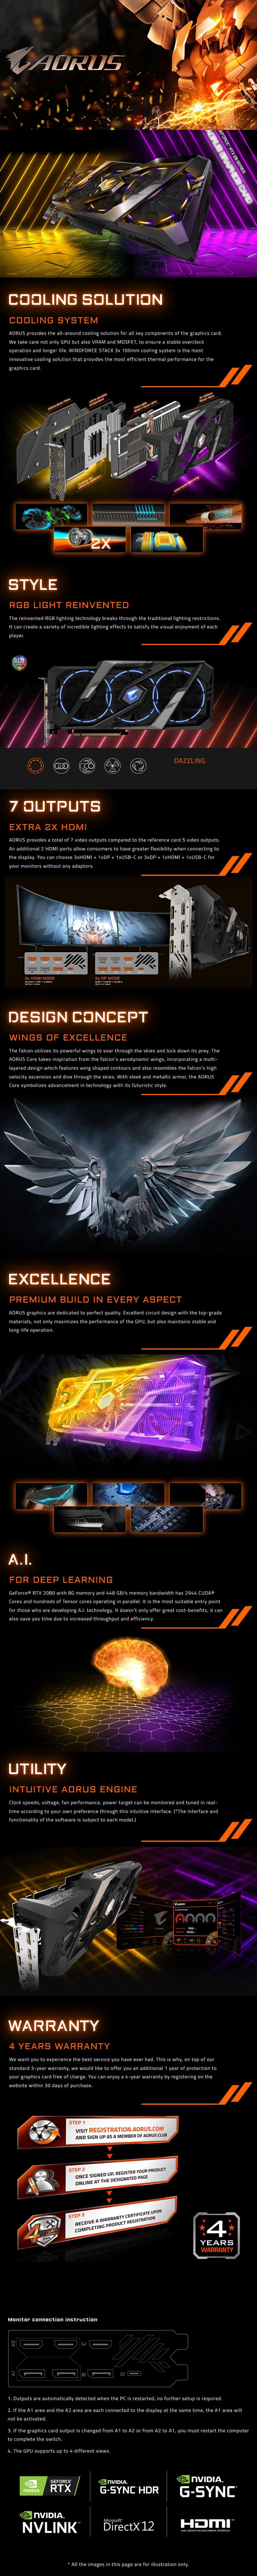 Gigabyte AORUS GeForce RTX 2080 8GB Video Card - Desktop Overview 1